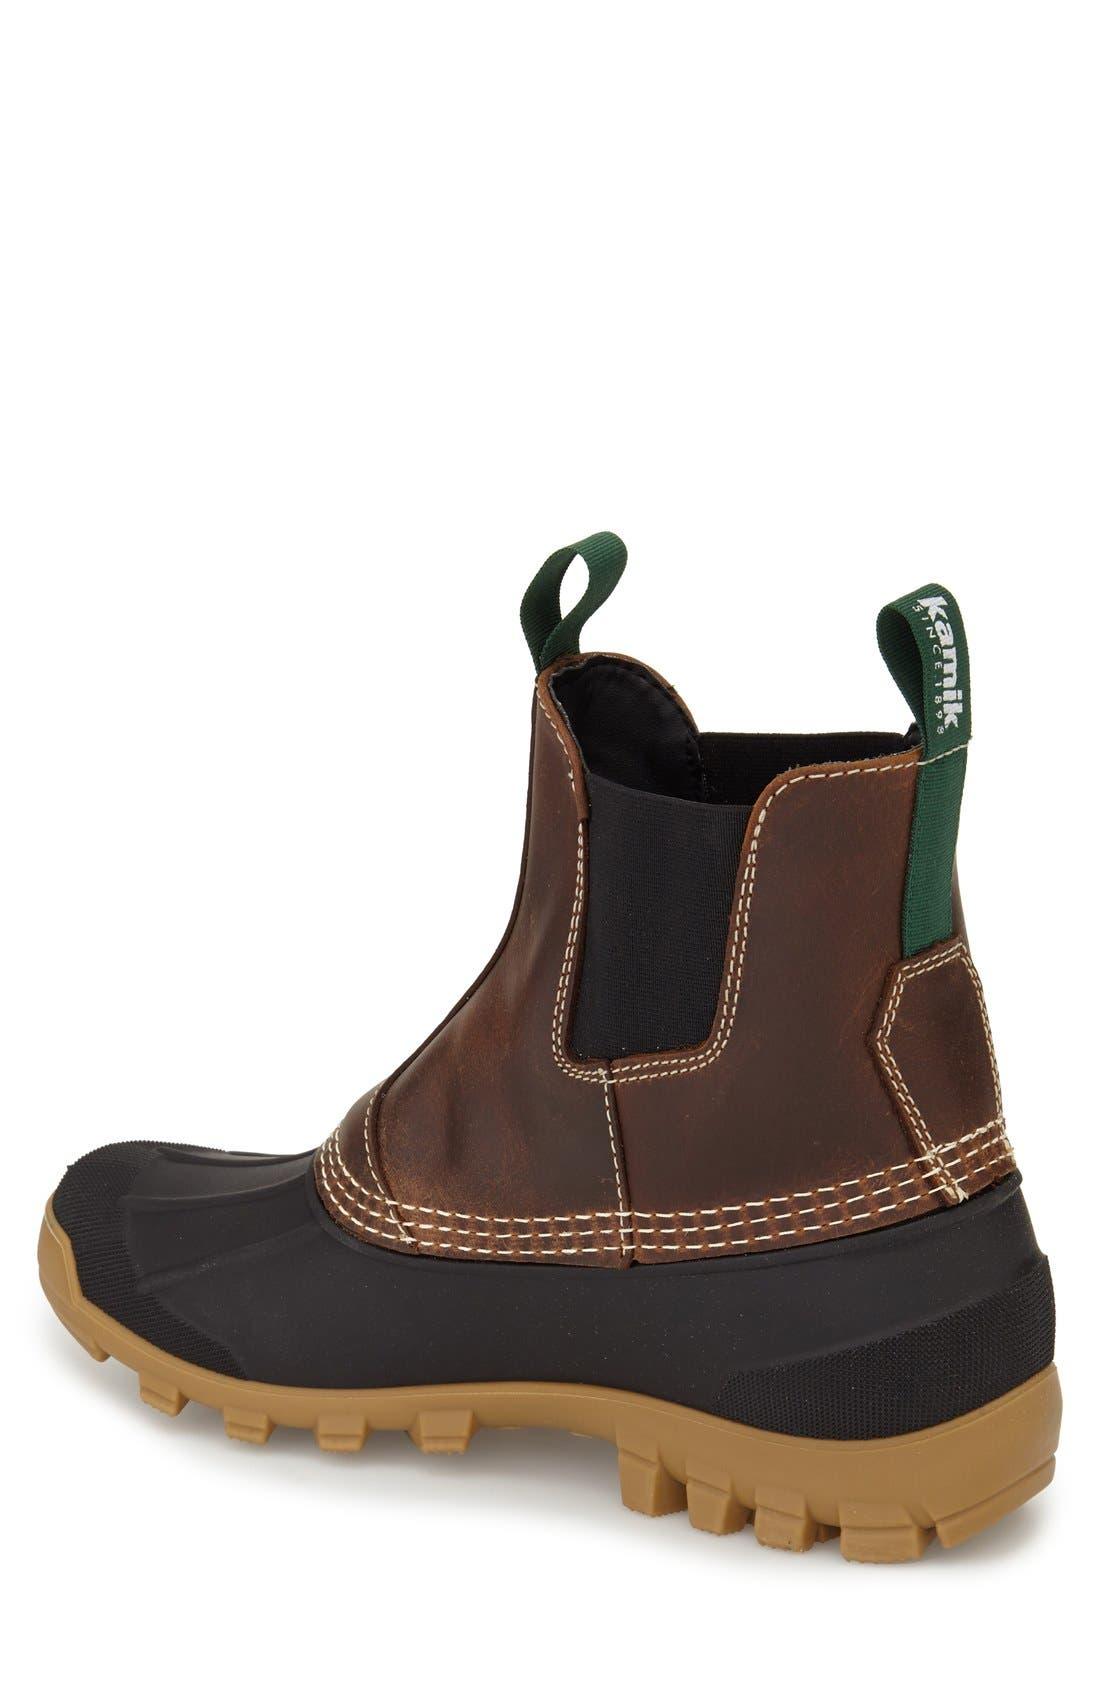 Yukon C Snow Waterproof Boot,                             Alternate thumbnail 2, color,                             DARK BROWN LEATHER